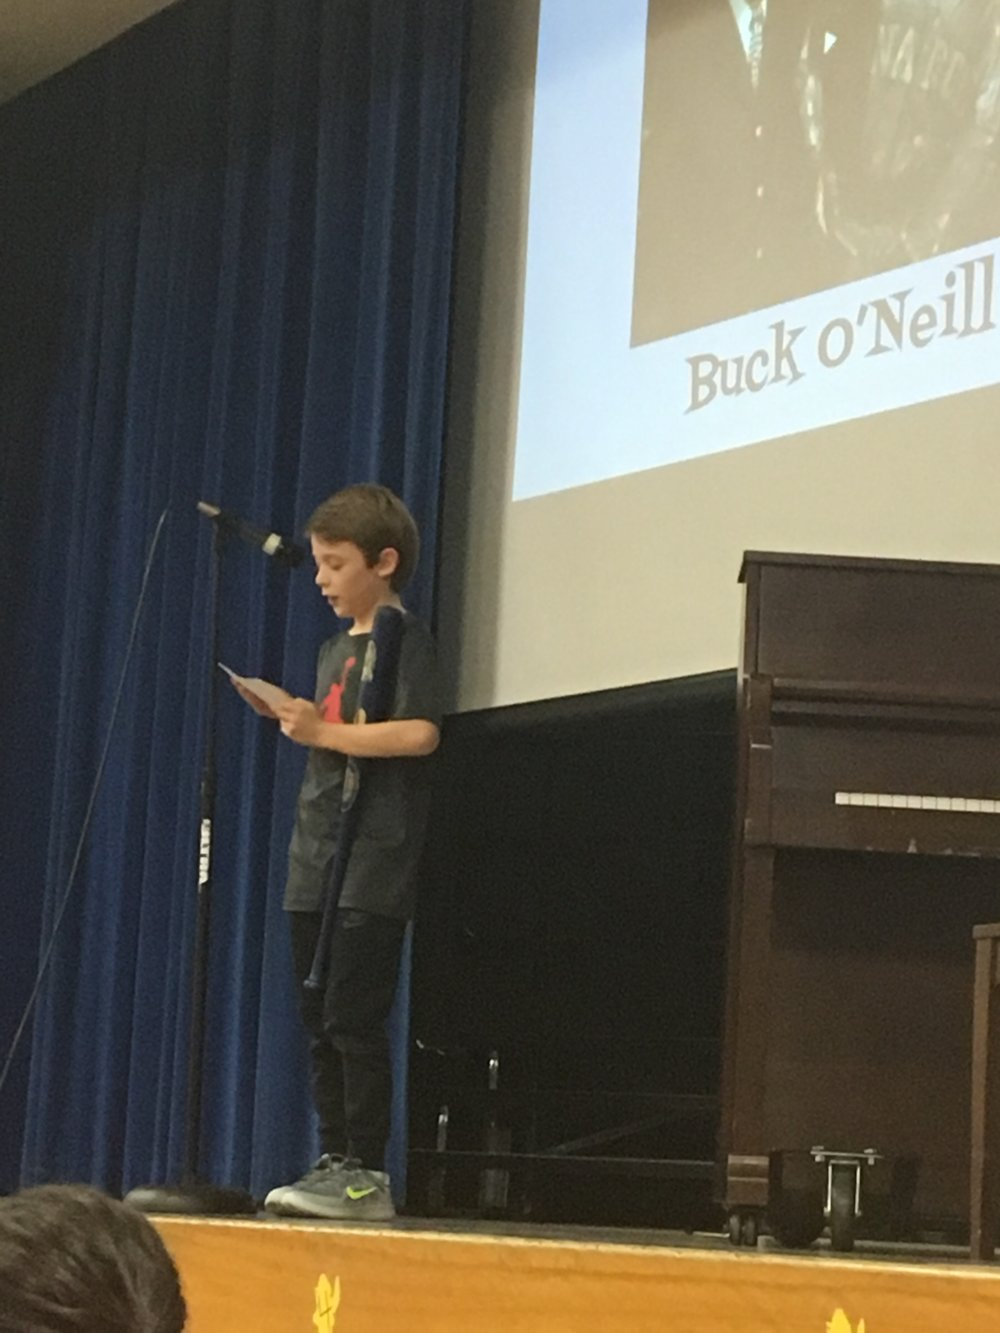 Grayson Groves honors Buck O'Neil.